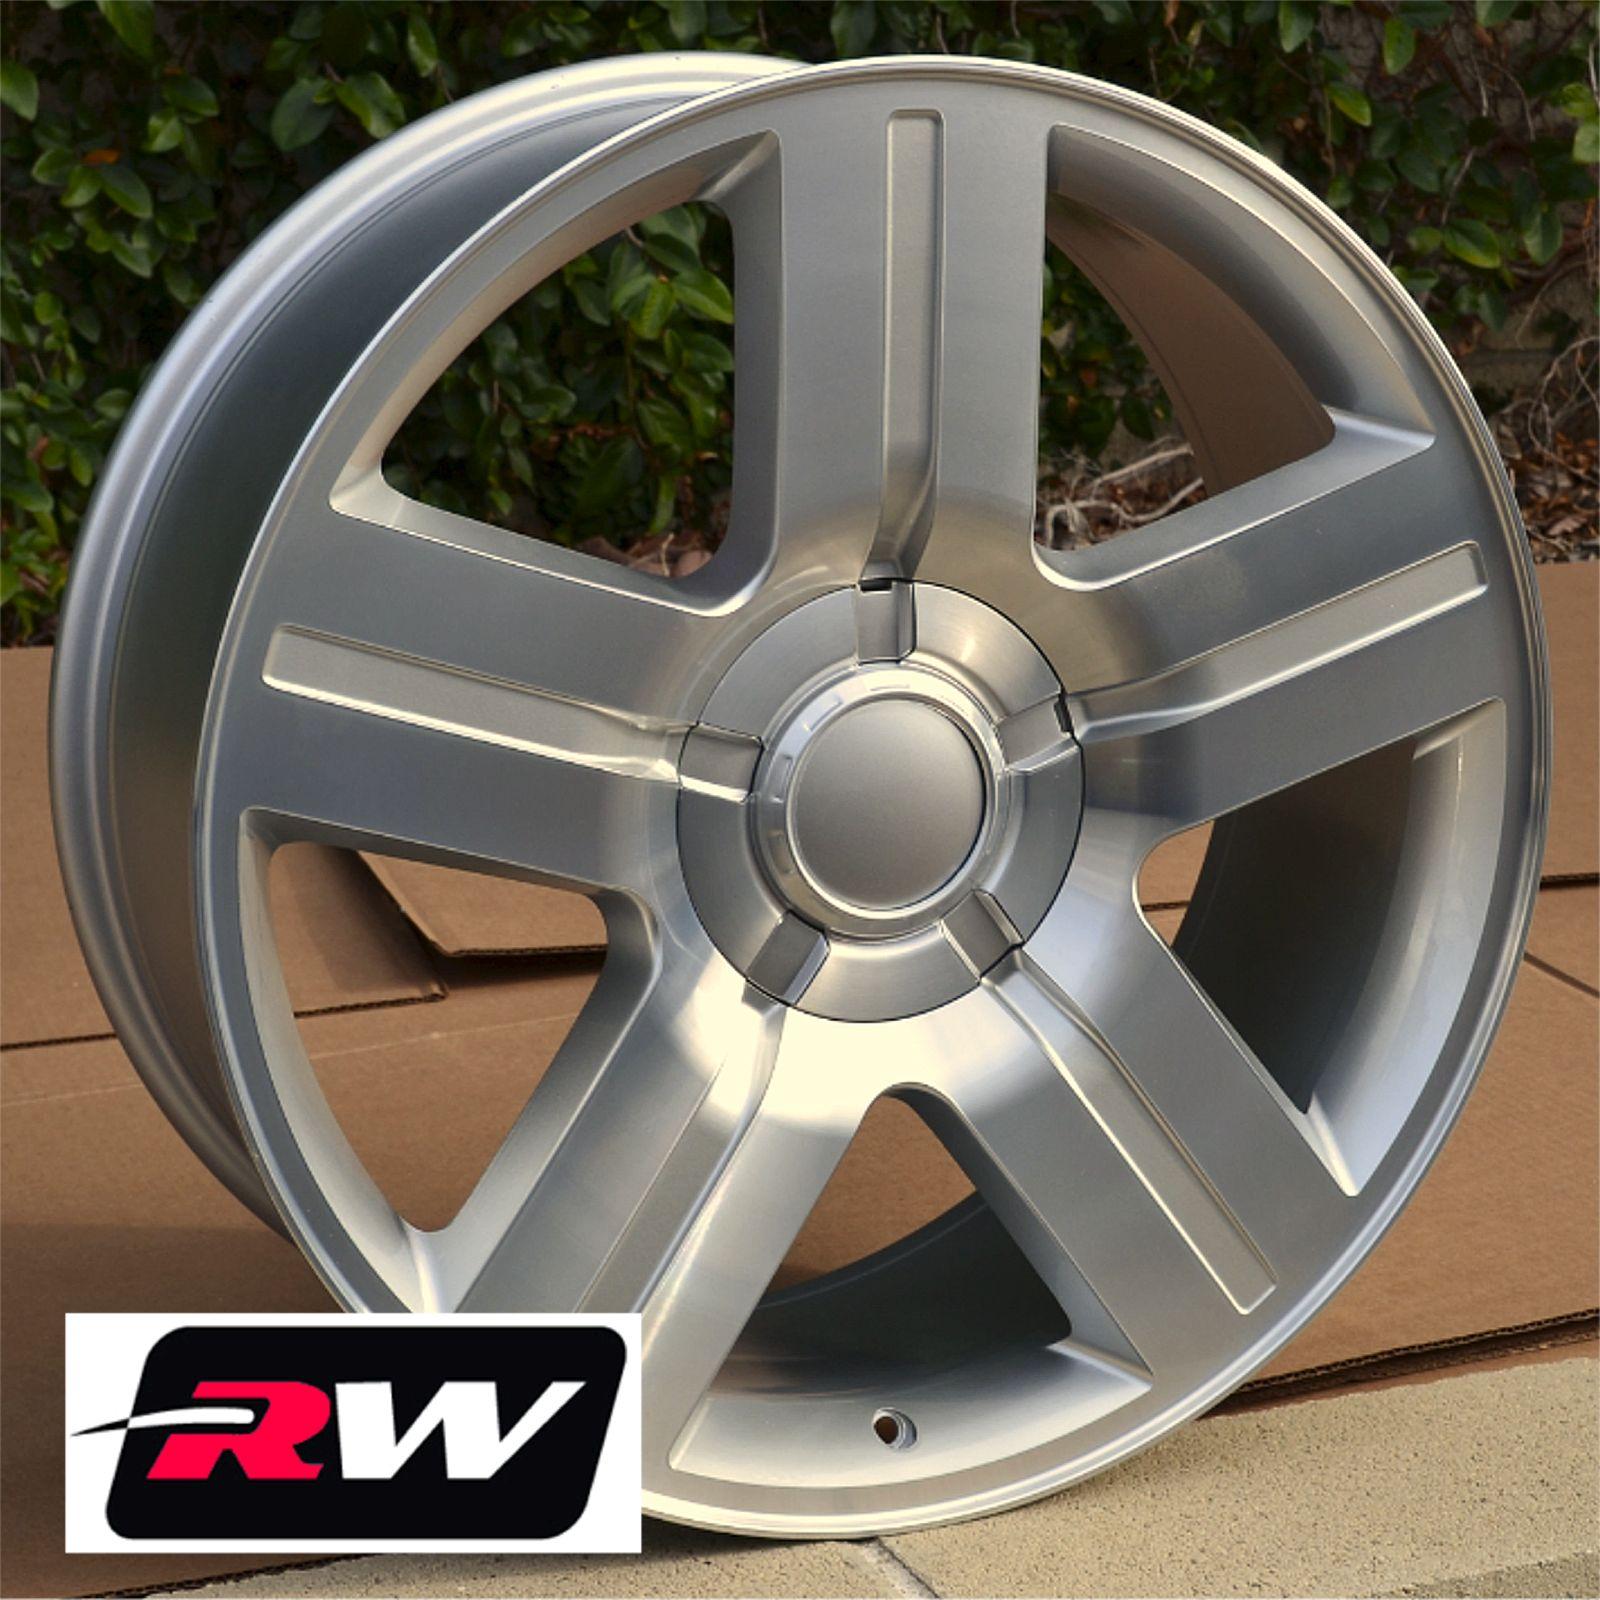 50 Inch Rims On Chevy : Chevrolet silverado wheels texas edition rims silver